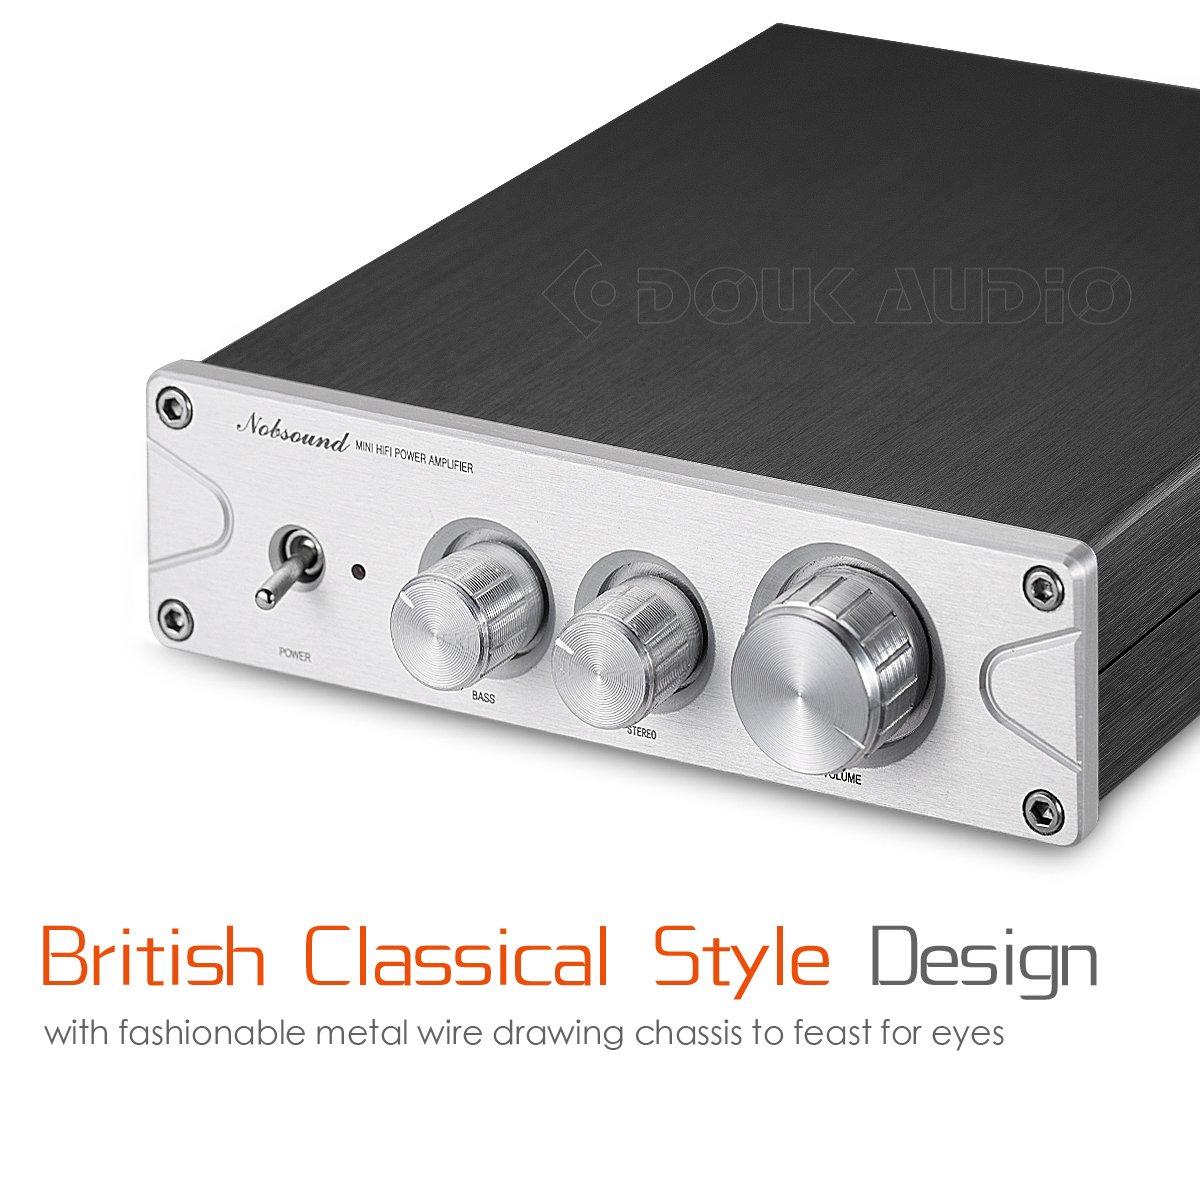 nobsound 200 W (100 W × 2) Bluetooth 5.0 atpx HD Power Amplifier Clase D Amplificador Estéreo Digital Amp Treble Bass Tone Control Audio: Amazon.es: ...